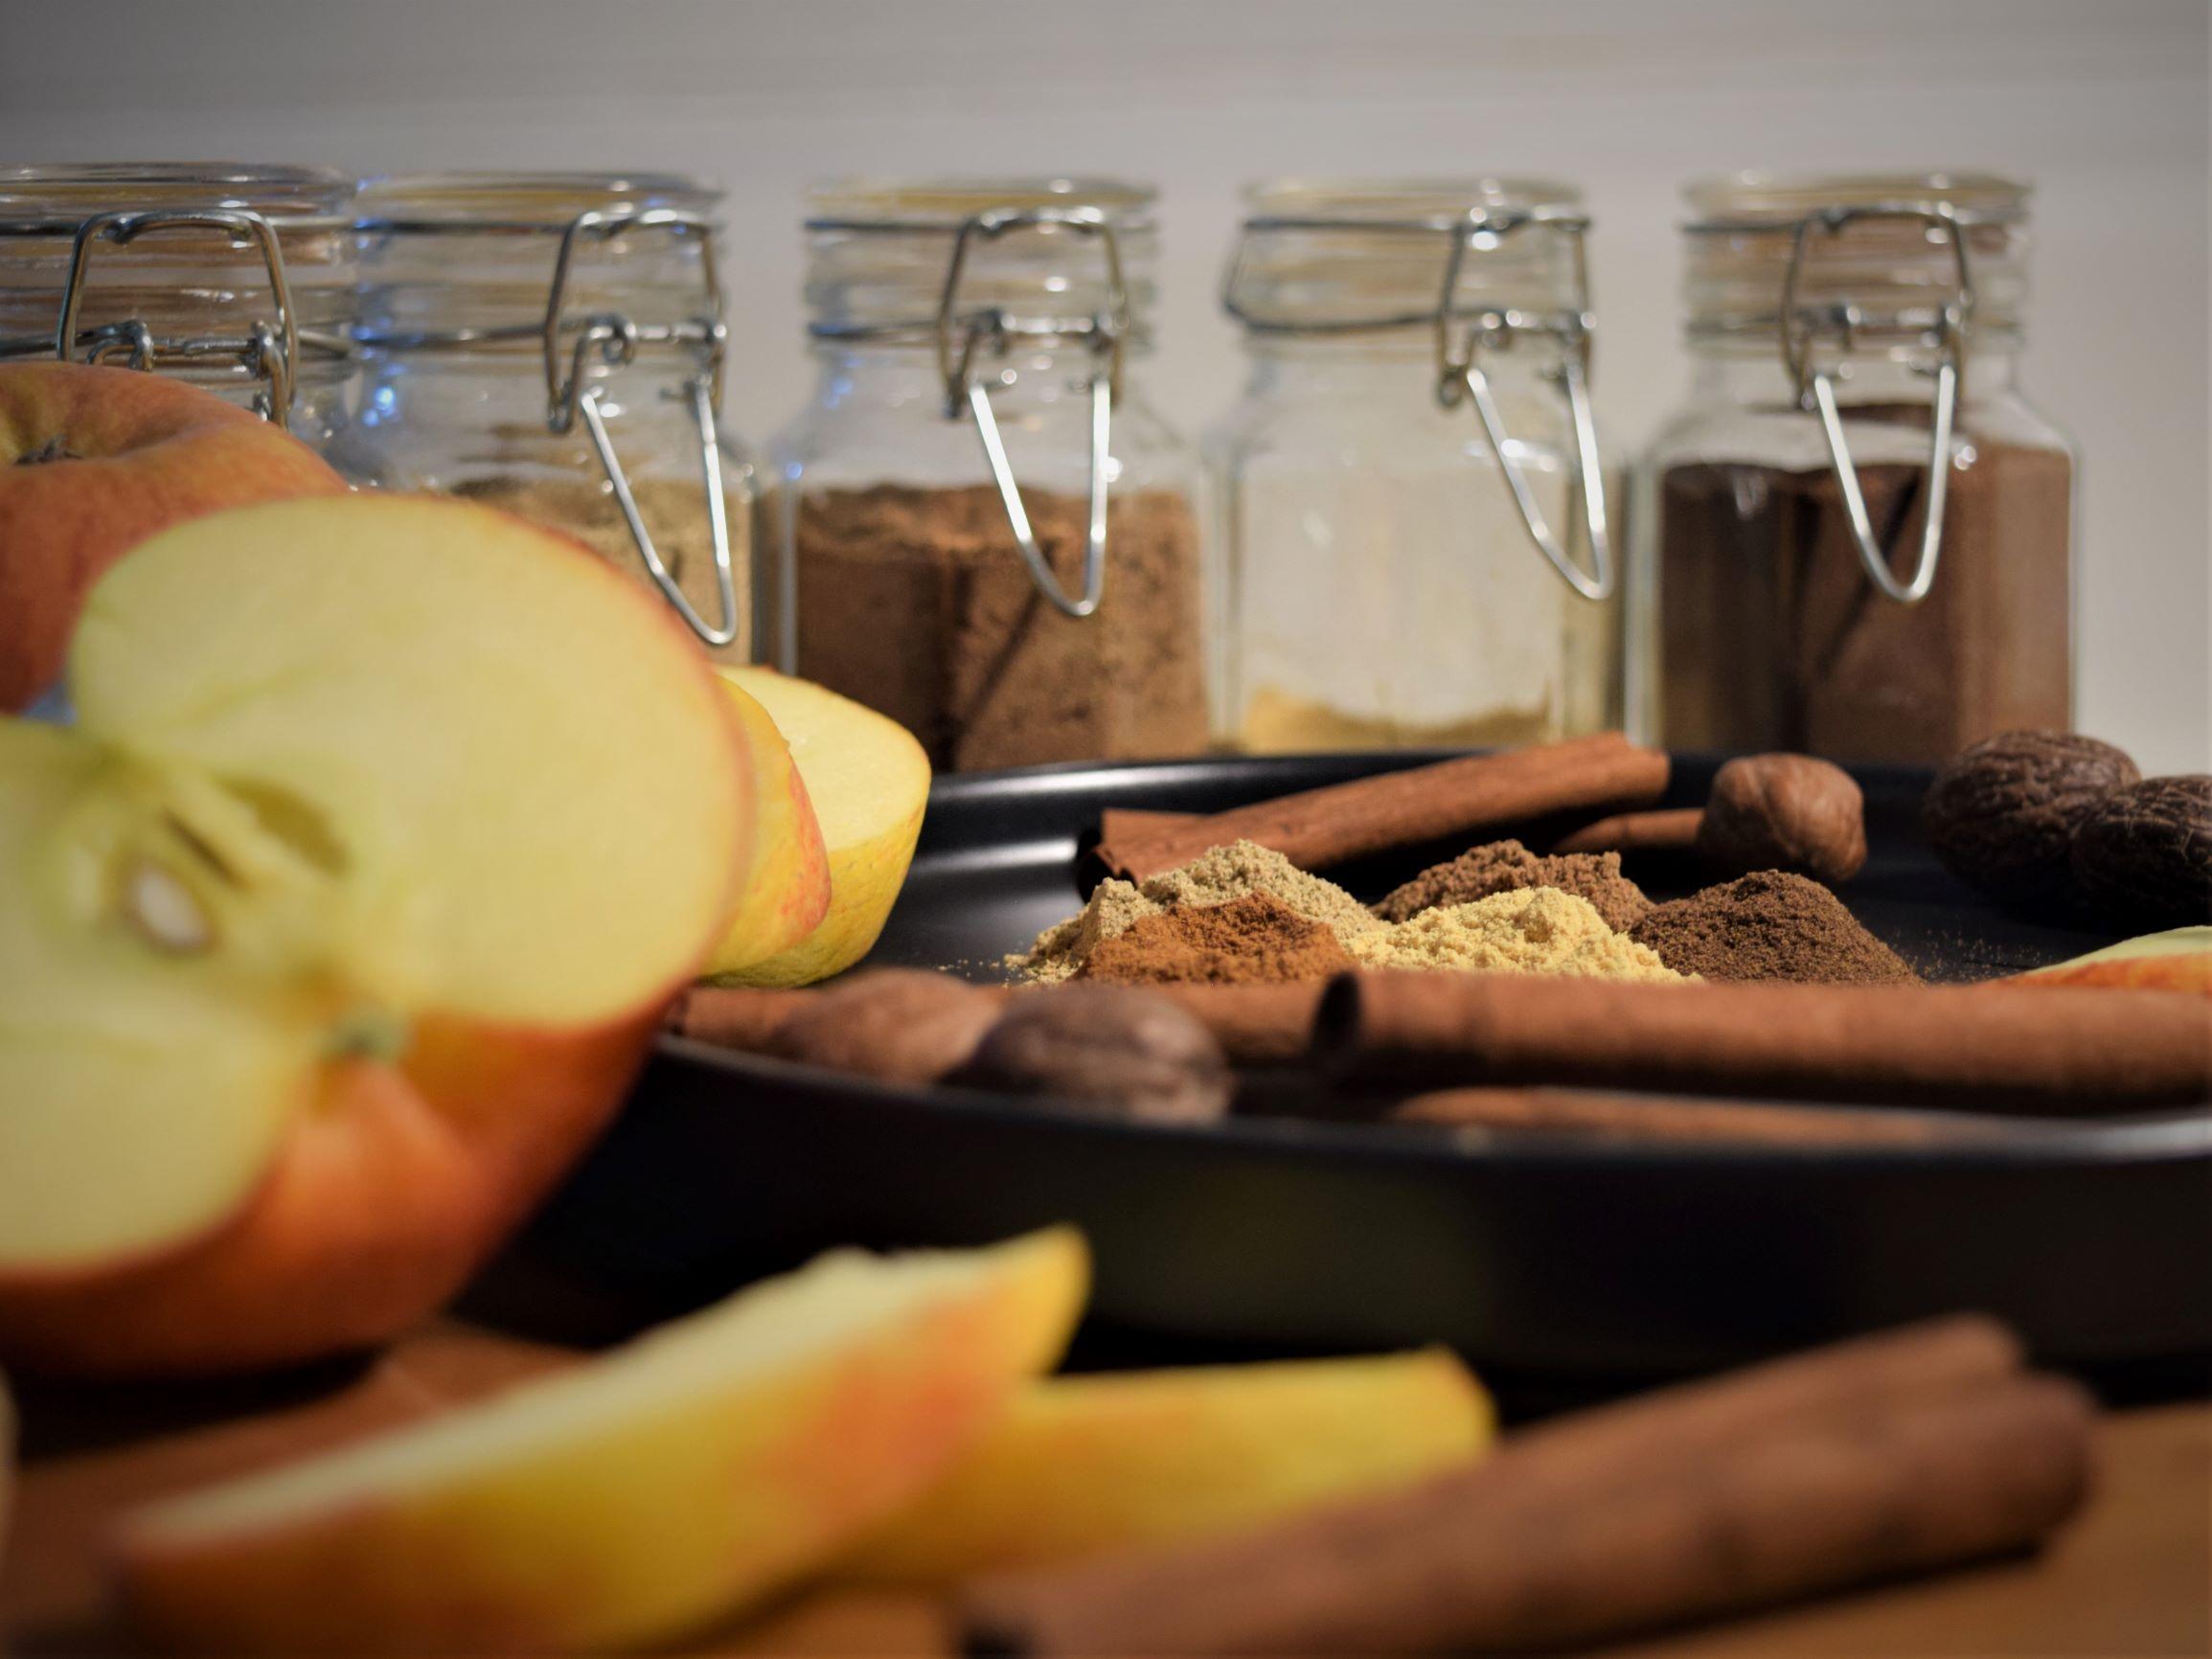 fall spice blend recipes apple pie spice bottle autumn baking dessert spoon warm cozy kitchen nutmeg cinnamon